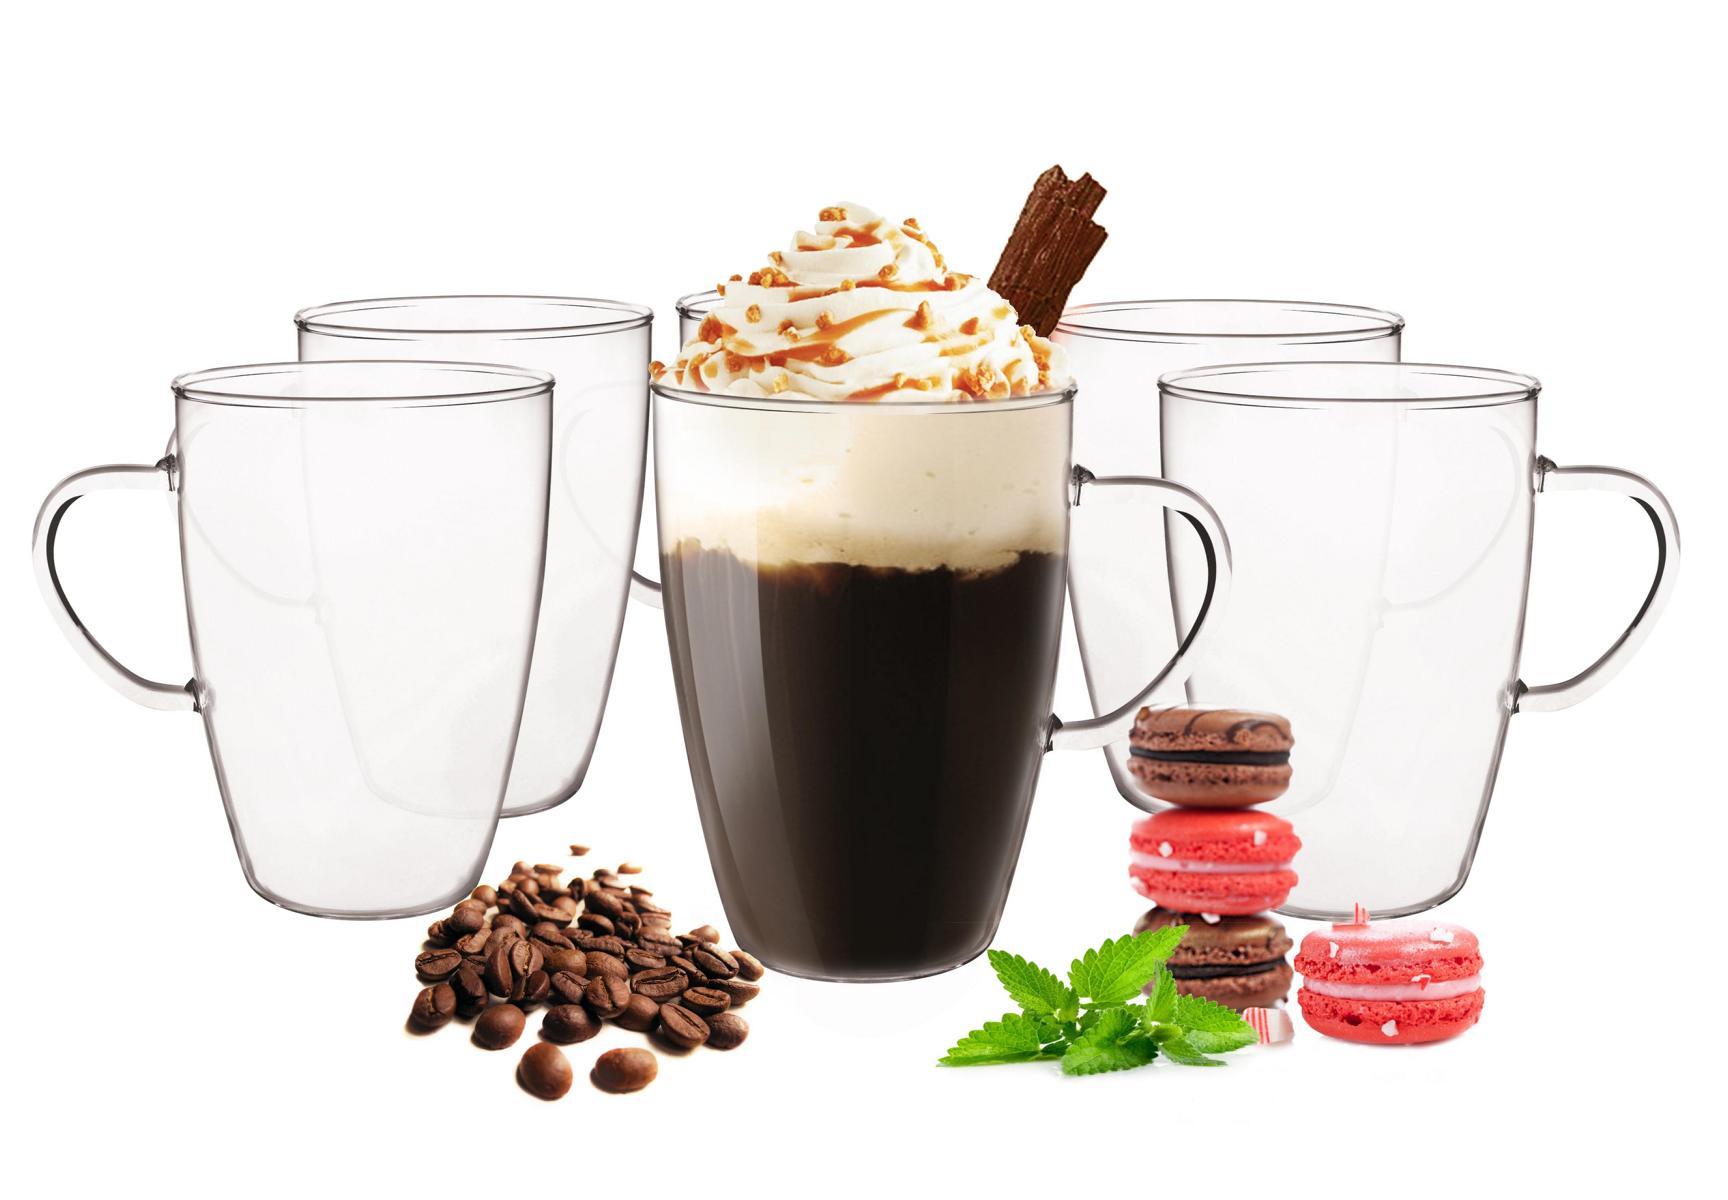 6 latte macchiato gl ser 350ml und 6 edelstahl l ffel kaffeegl ser teegl ser ebay. Black Bedroom Furniture Sets. Home Design Ideas